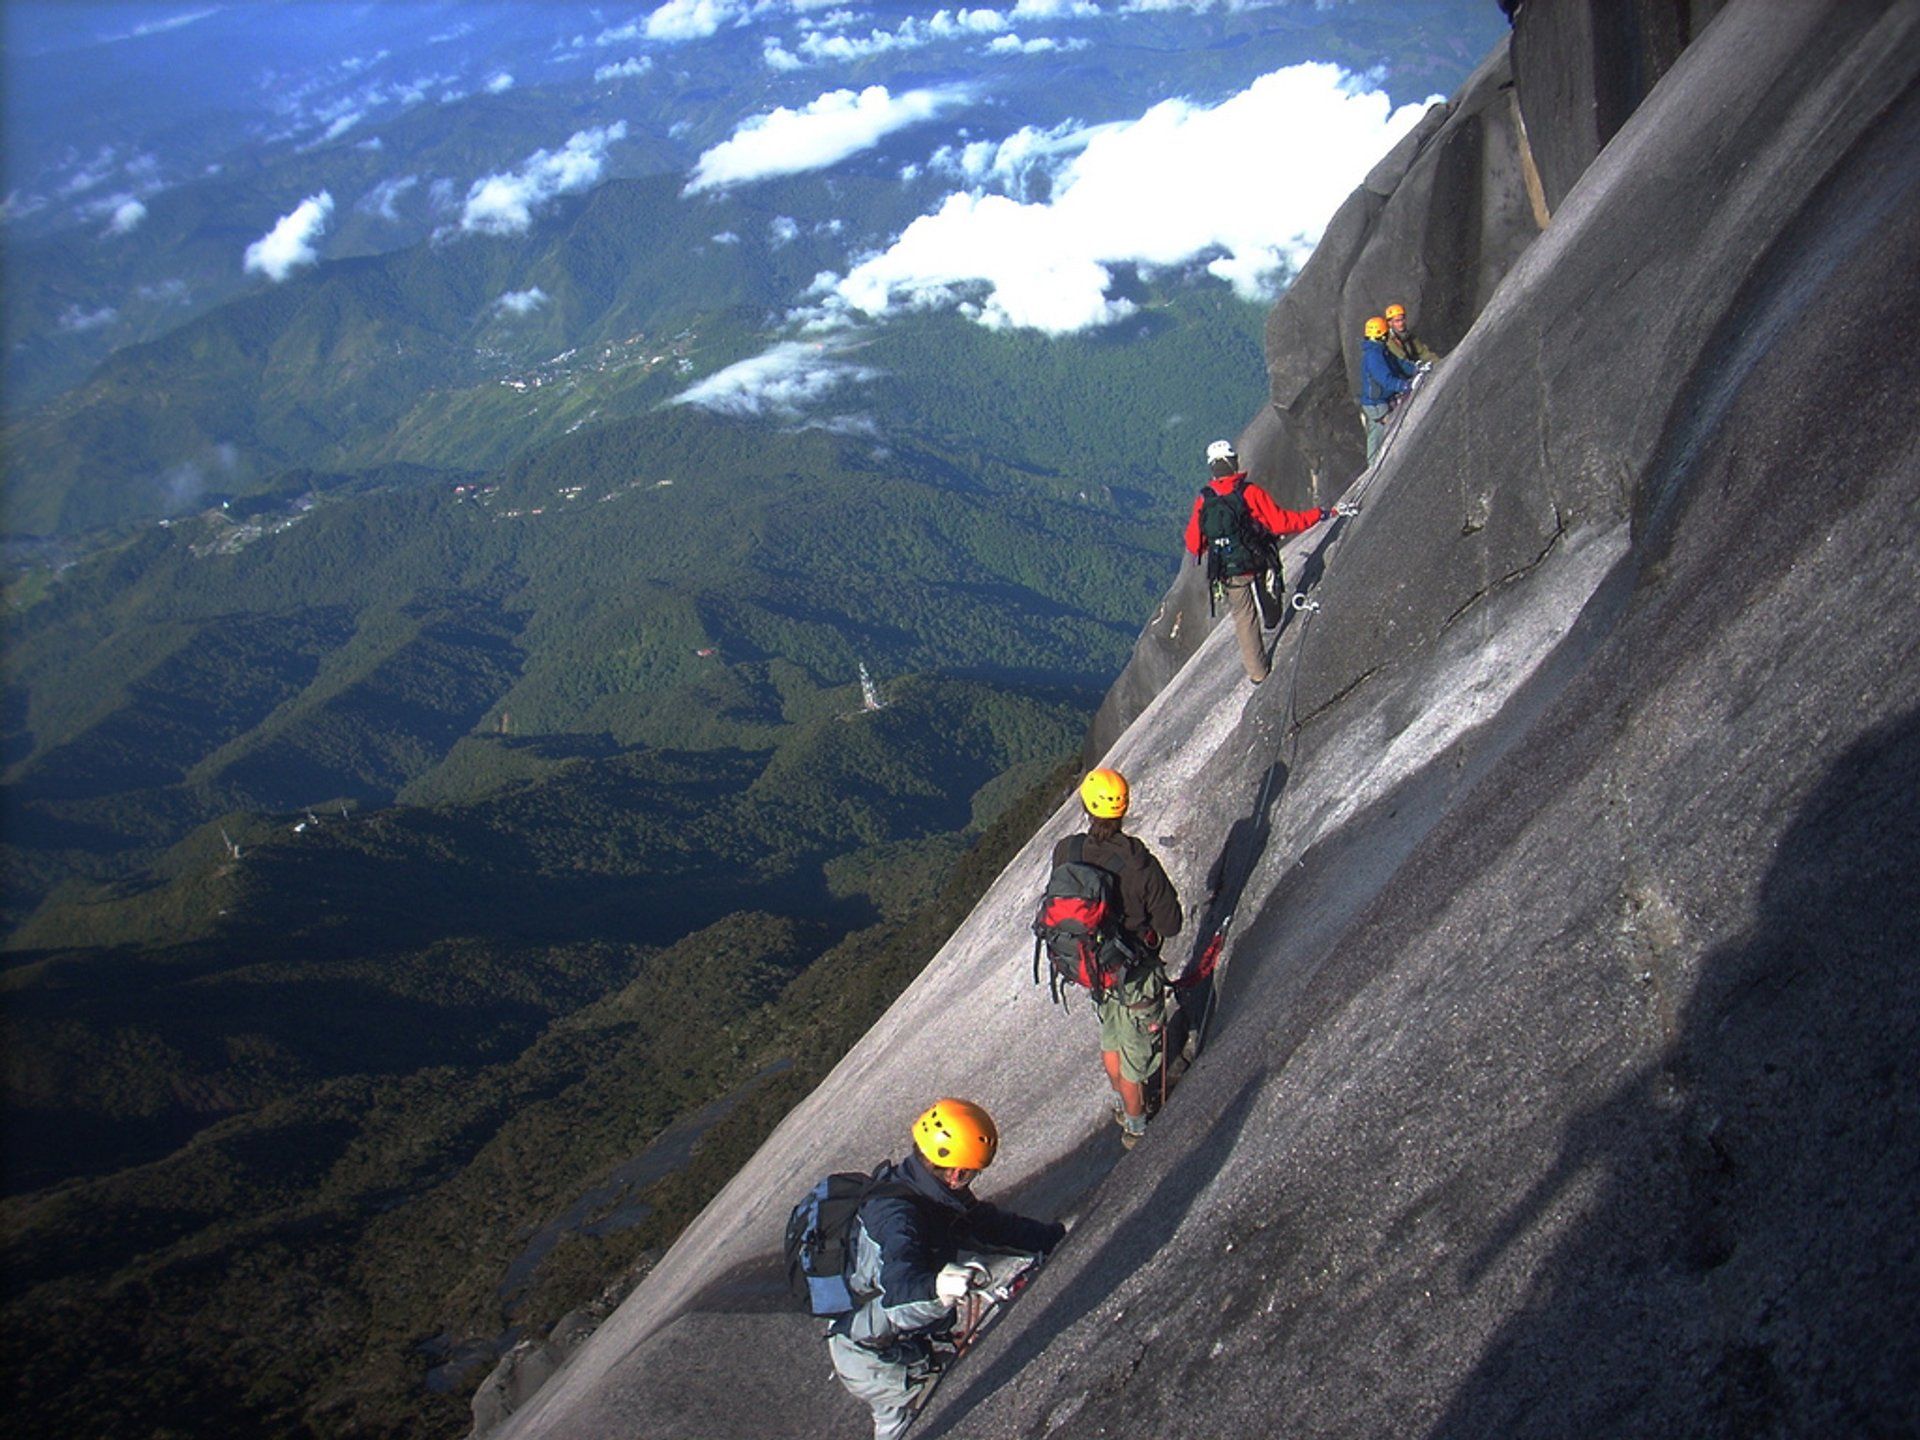 Mountain Torq Via Ferrata in Borneo 2020 - Best Time